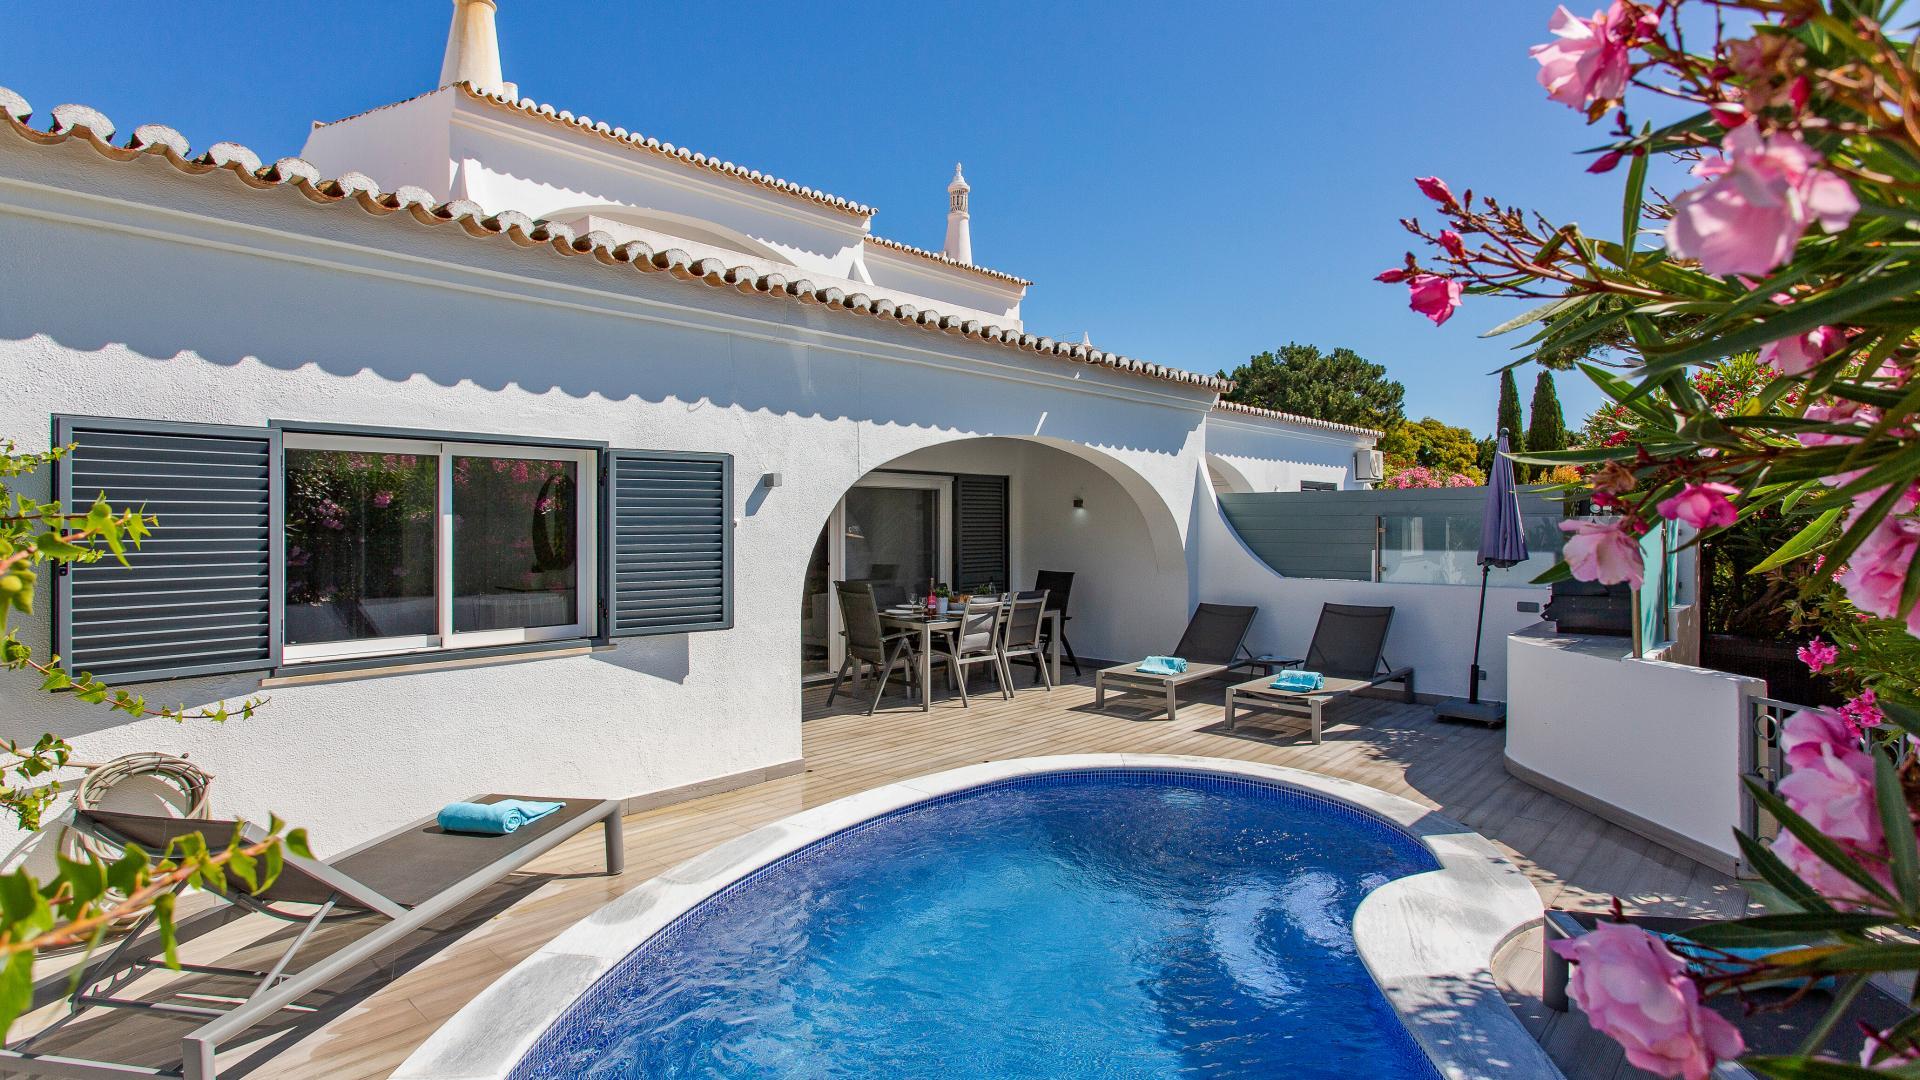 Villa Amara - Vale do Lobo, Algarve - 1.png